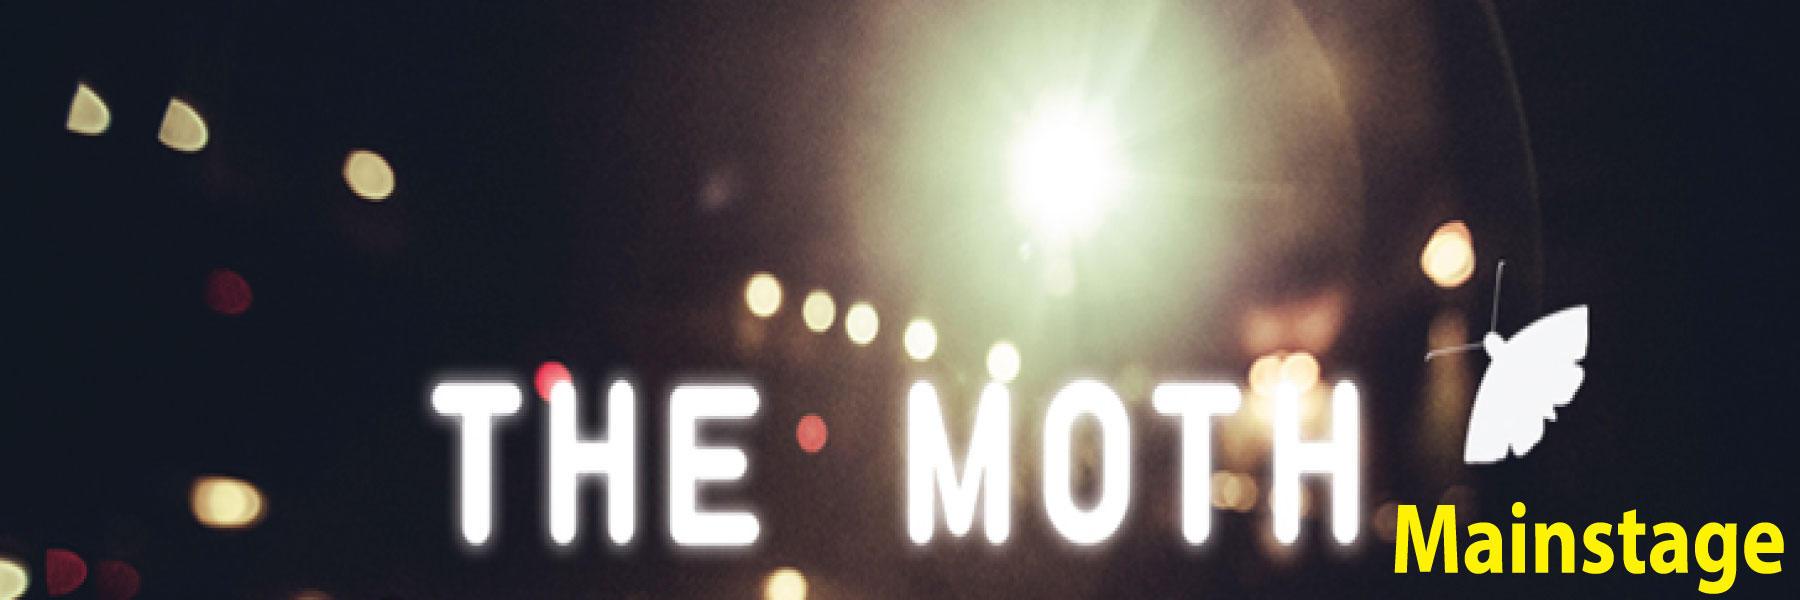 The Moth Mainstage Lands At San Antonio Book Festival